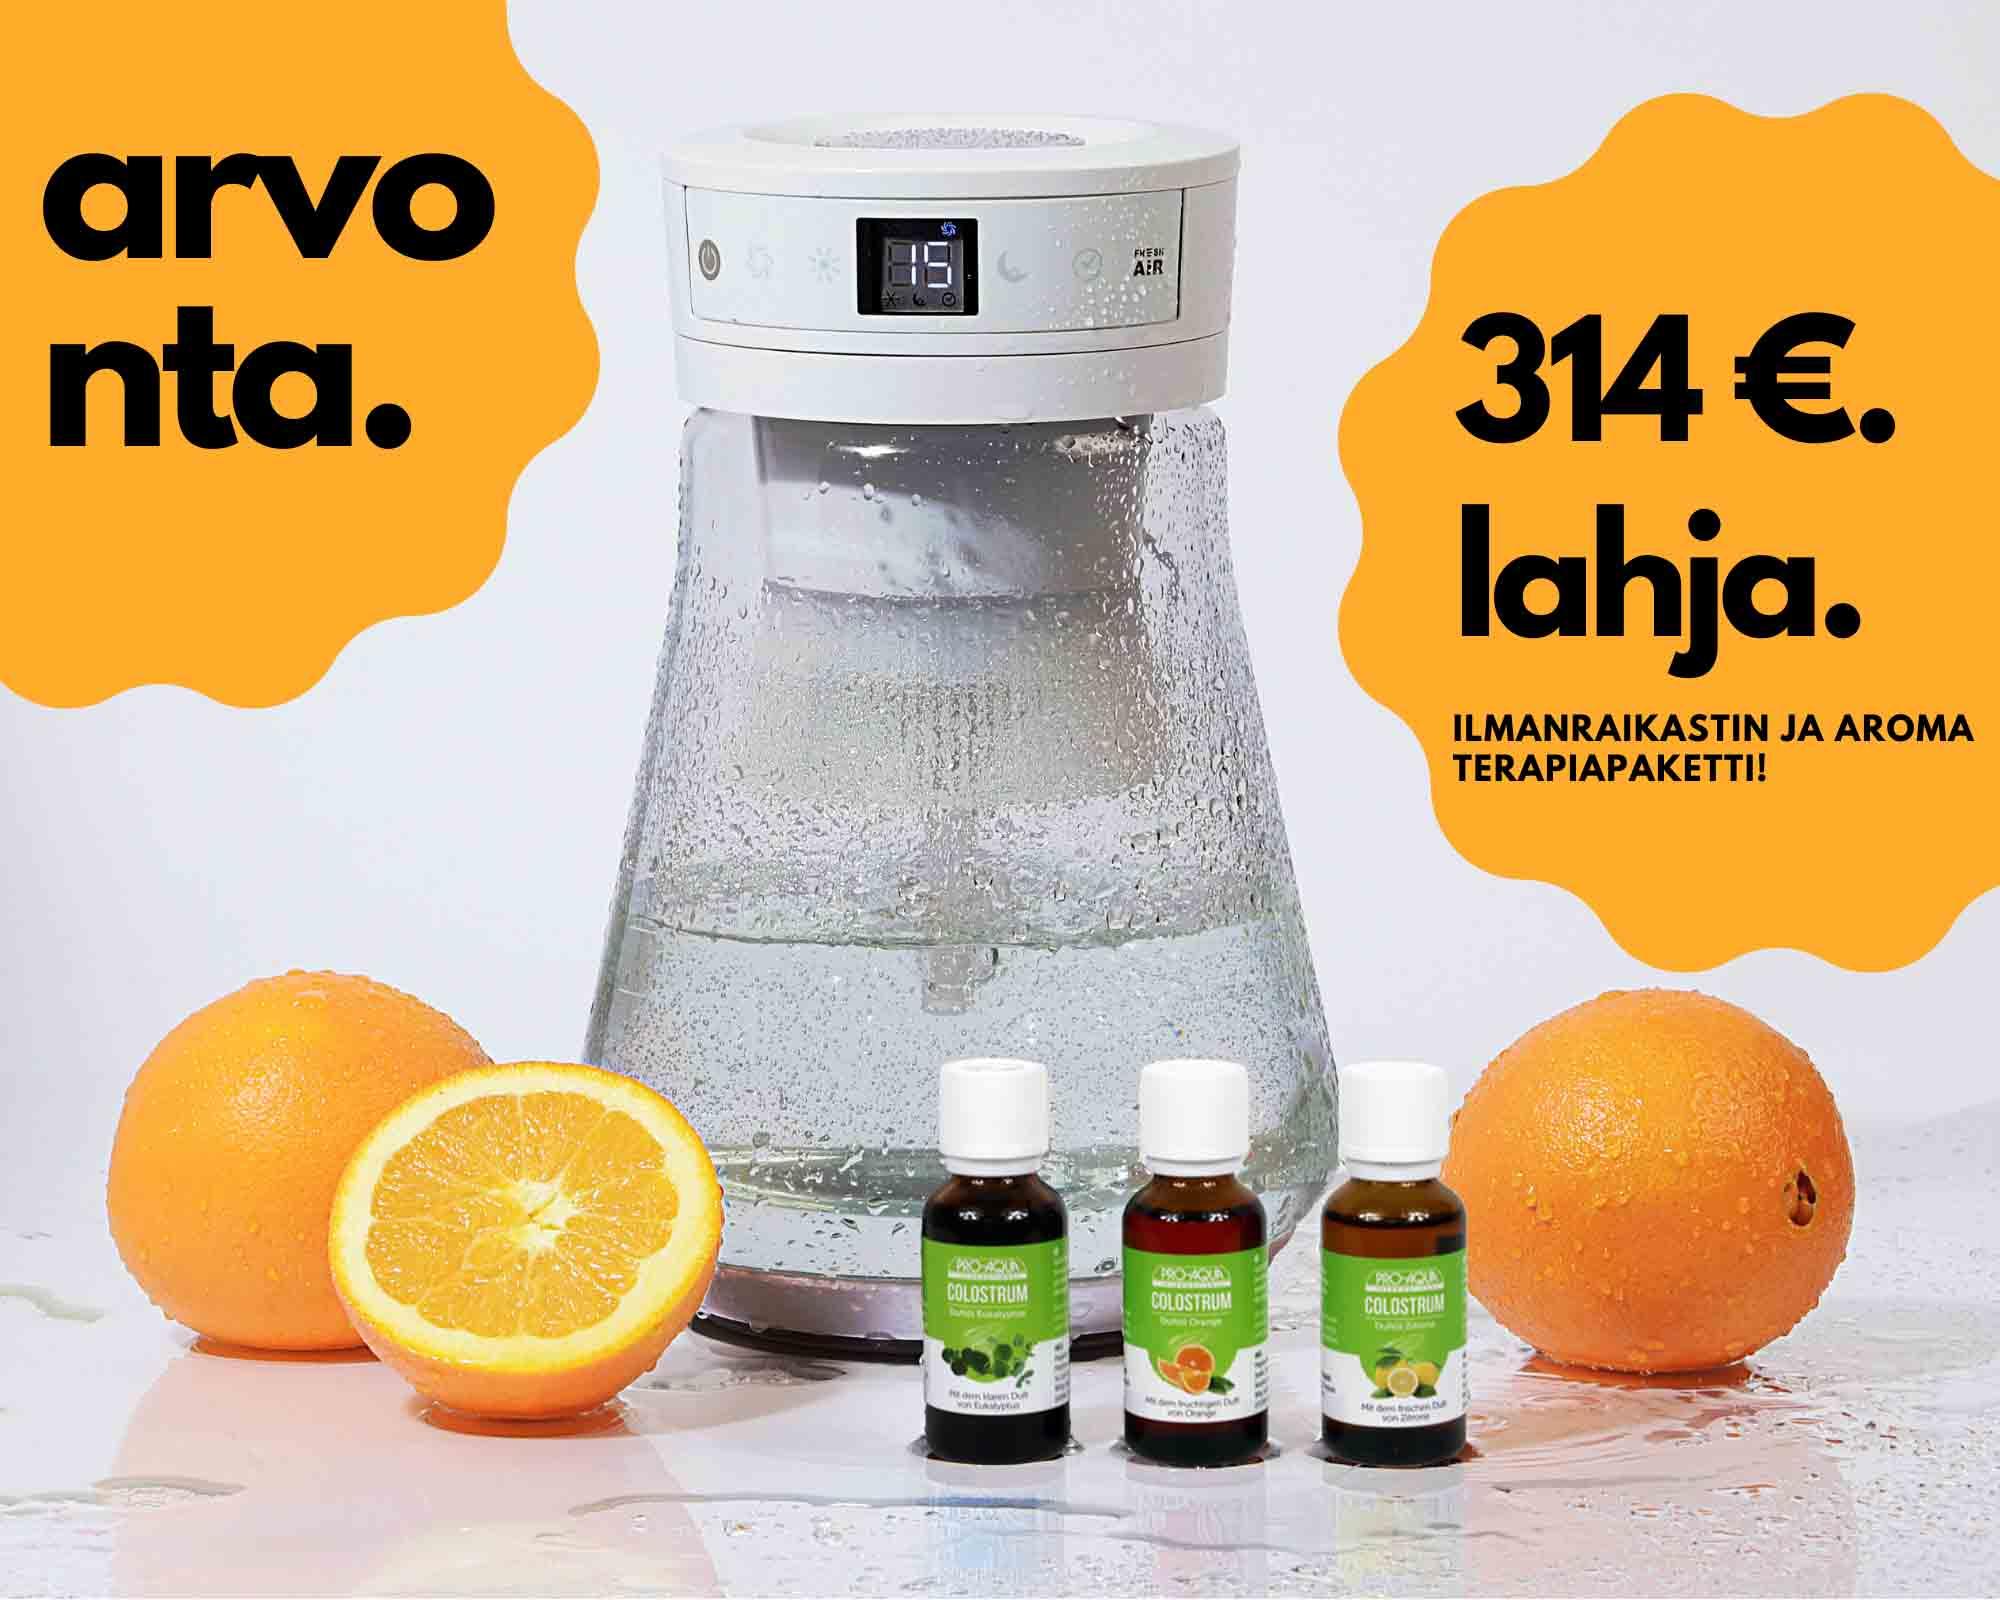 PRO-AQUA Arvonta 2021 Maaliskuu Ilmanraikastin ja aromaterapiapaketti